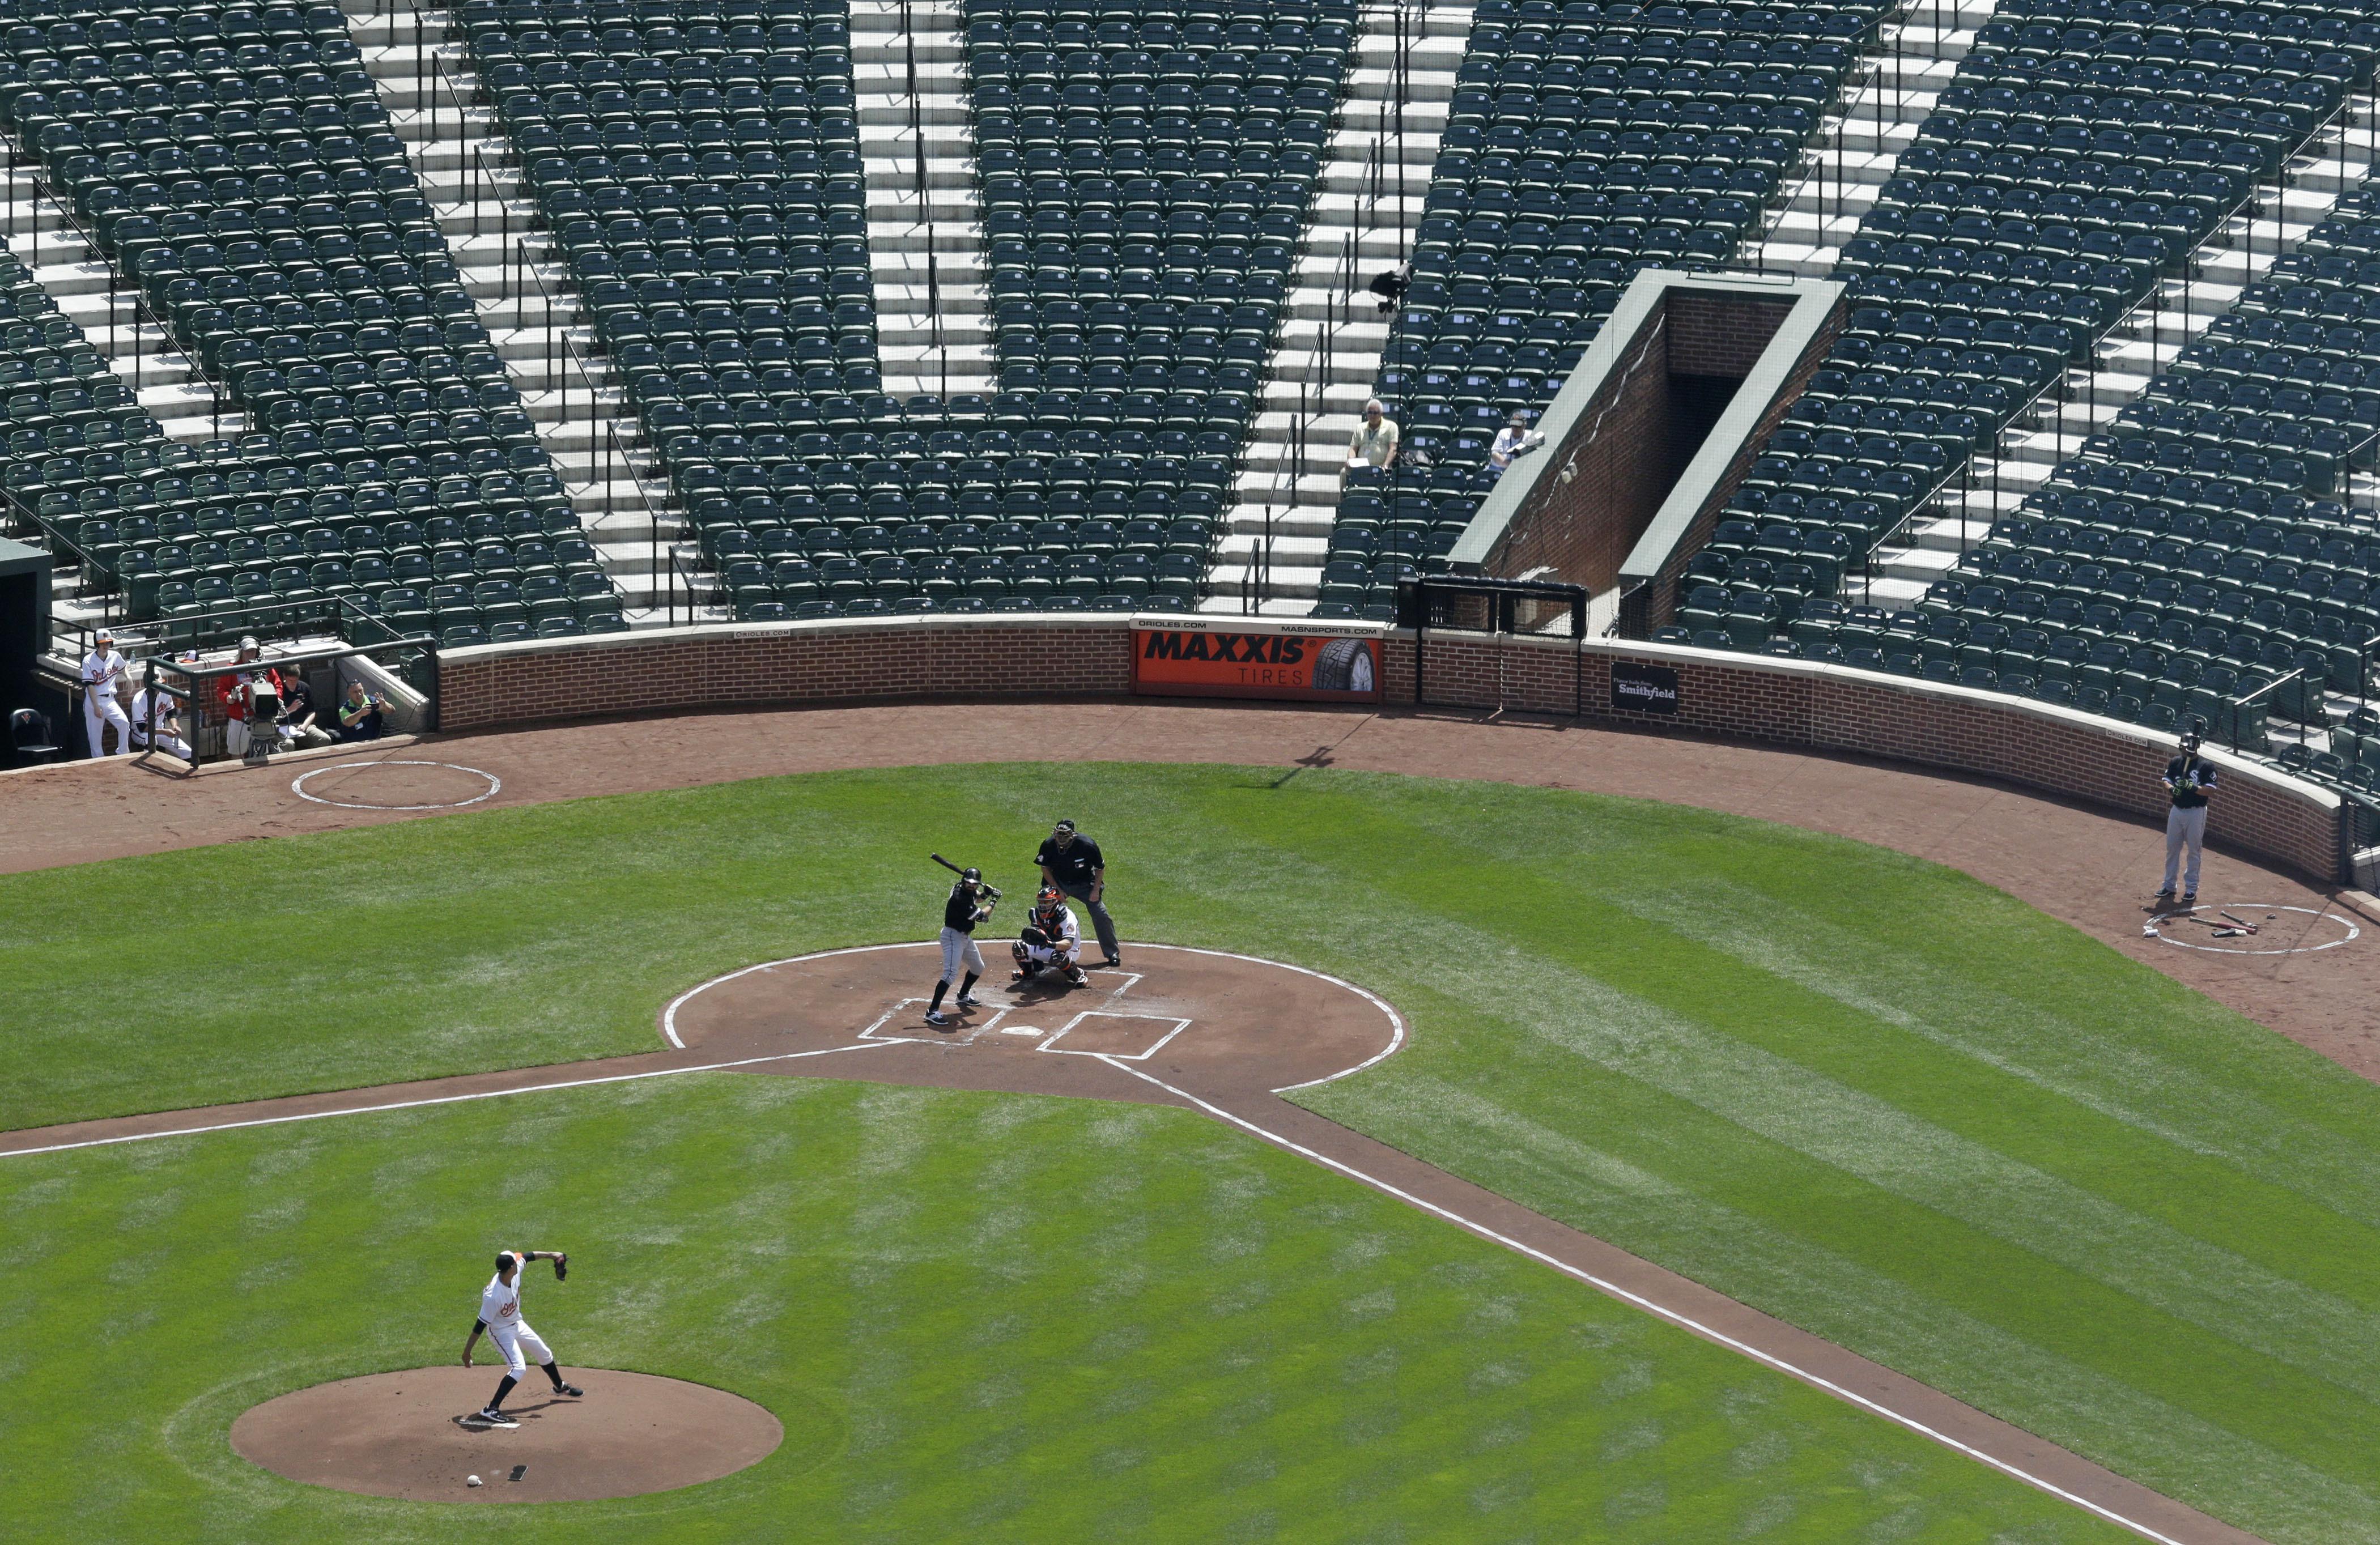 Baltimore Orioles Pics, Sports Collection